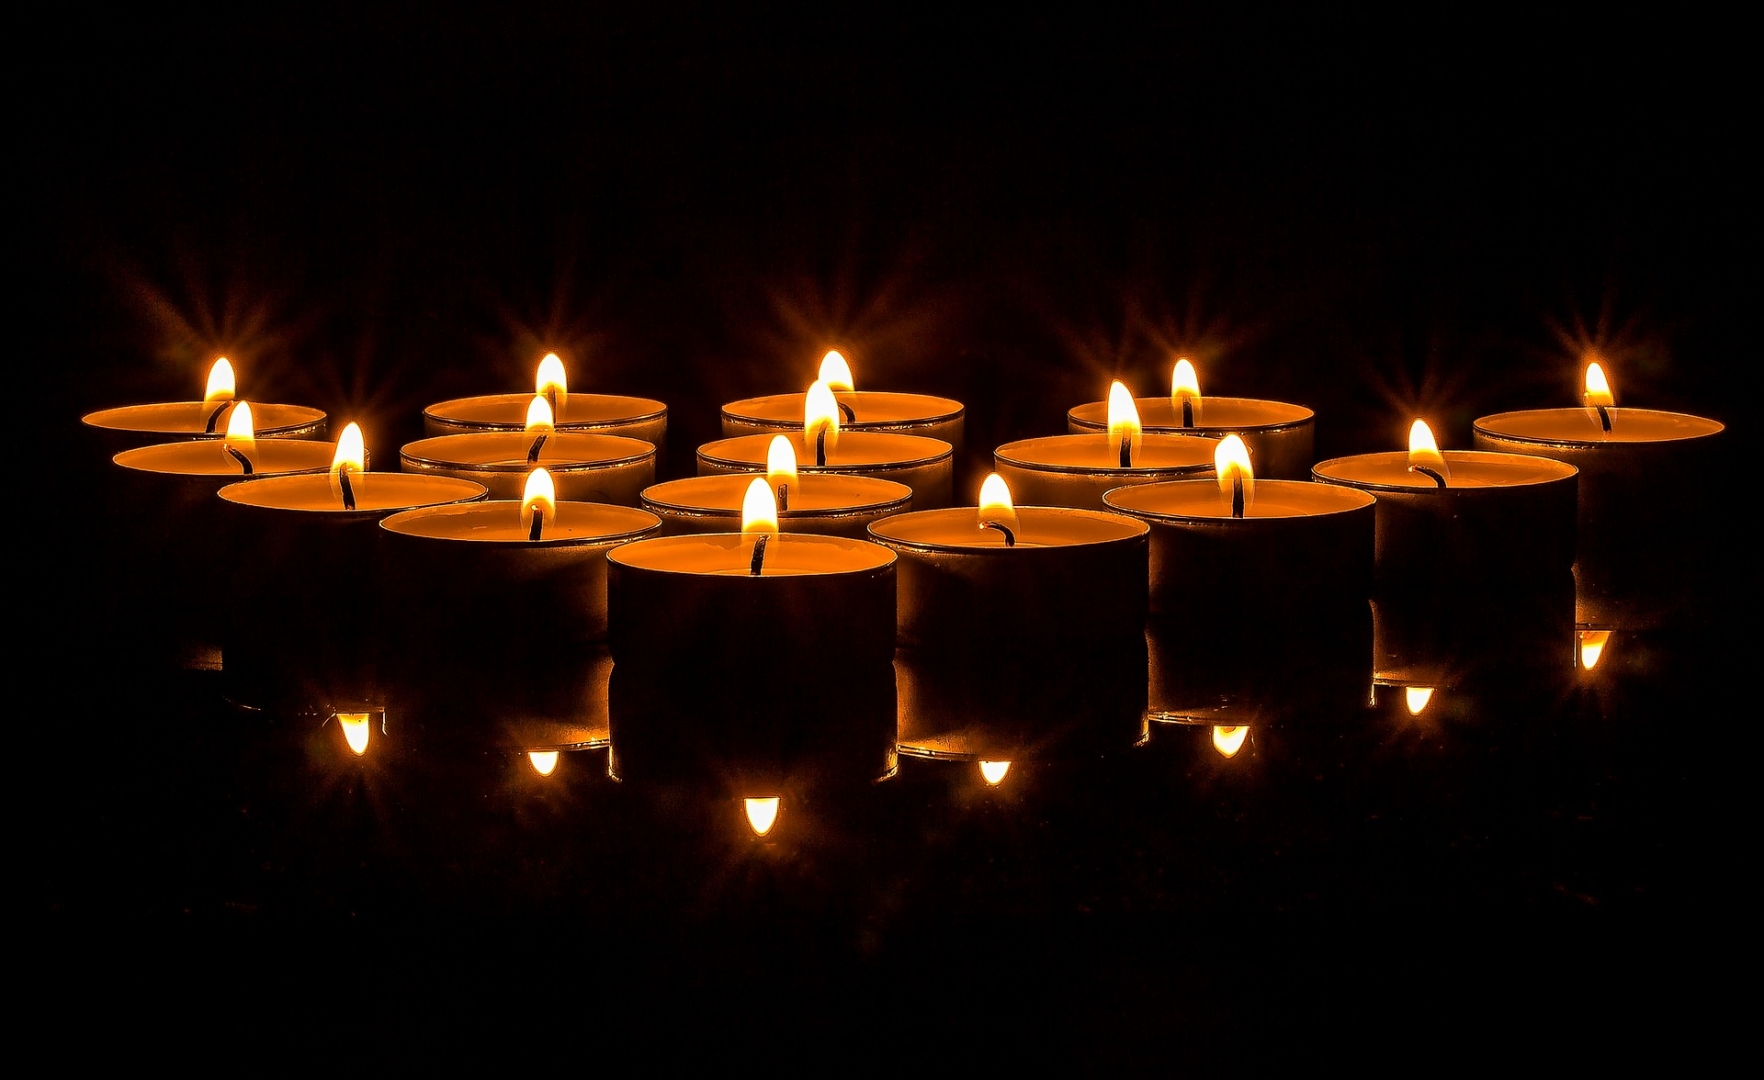 Траур свечи картинки